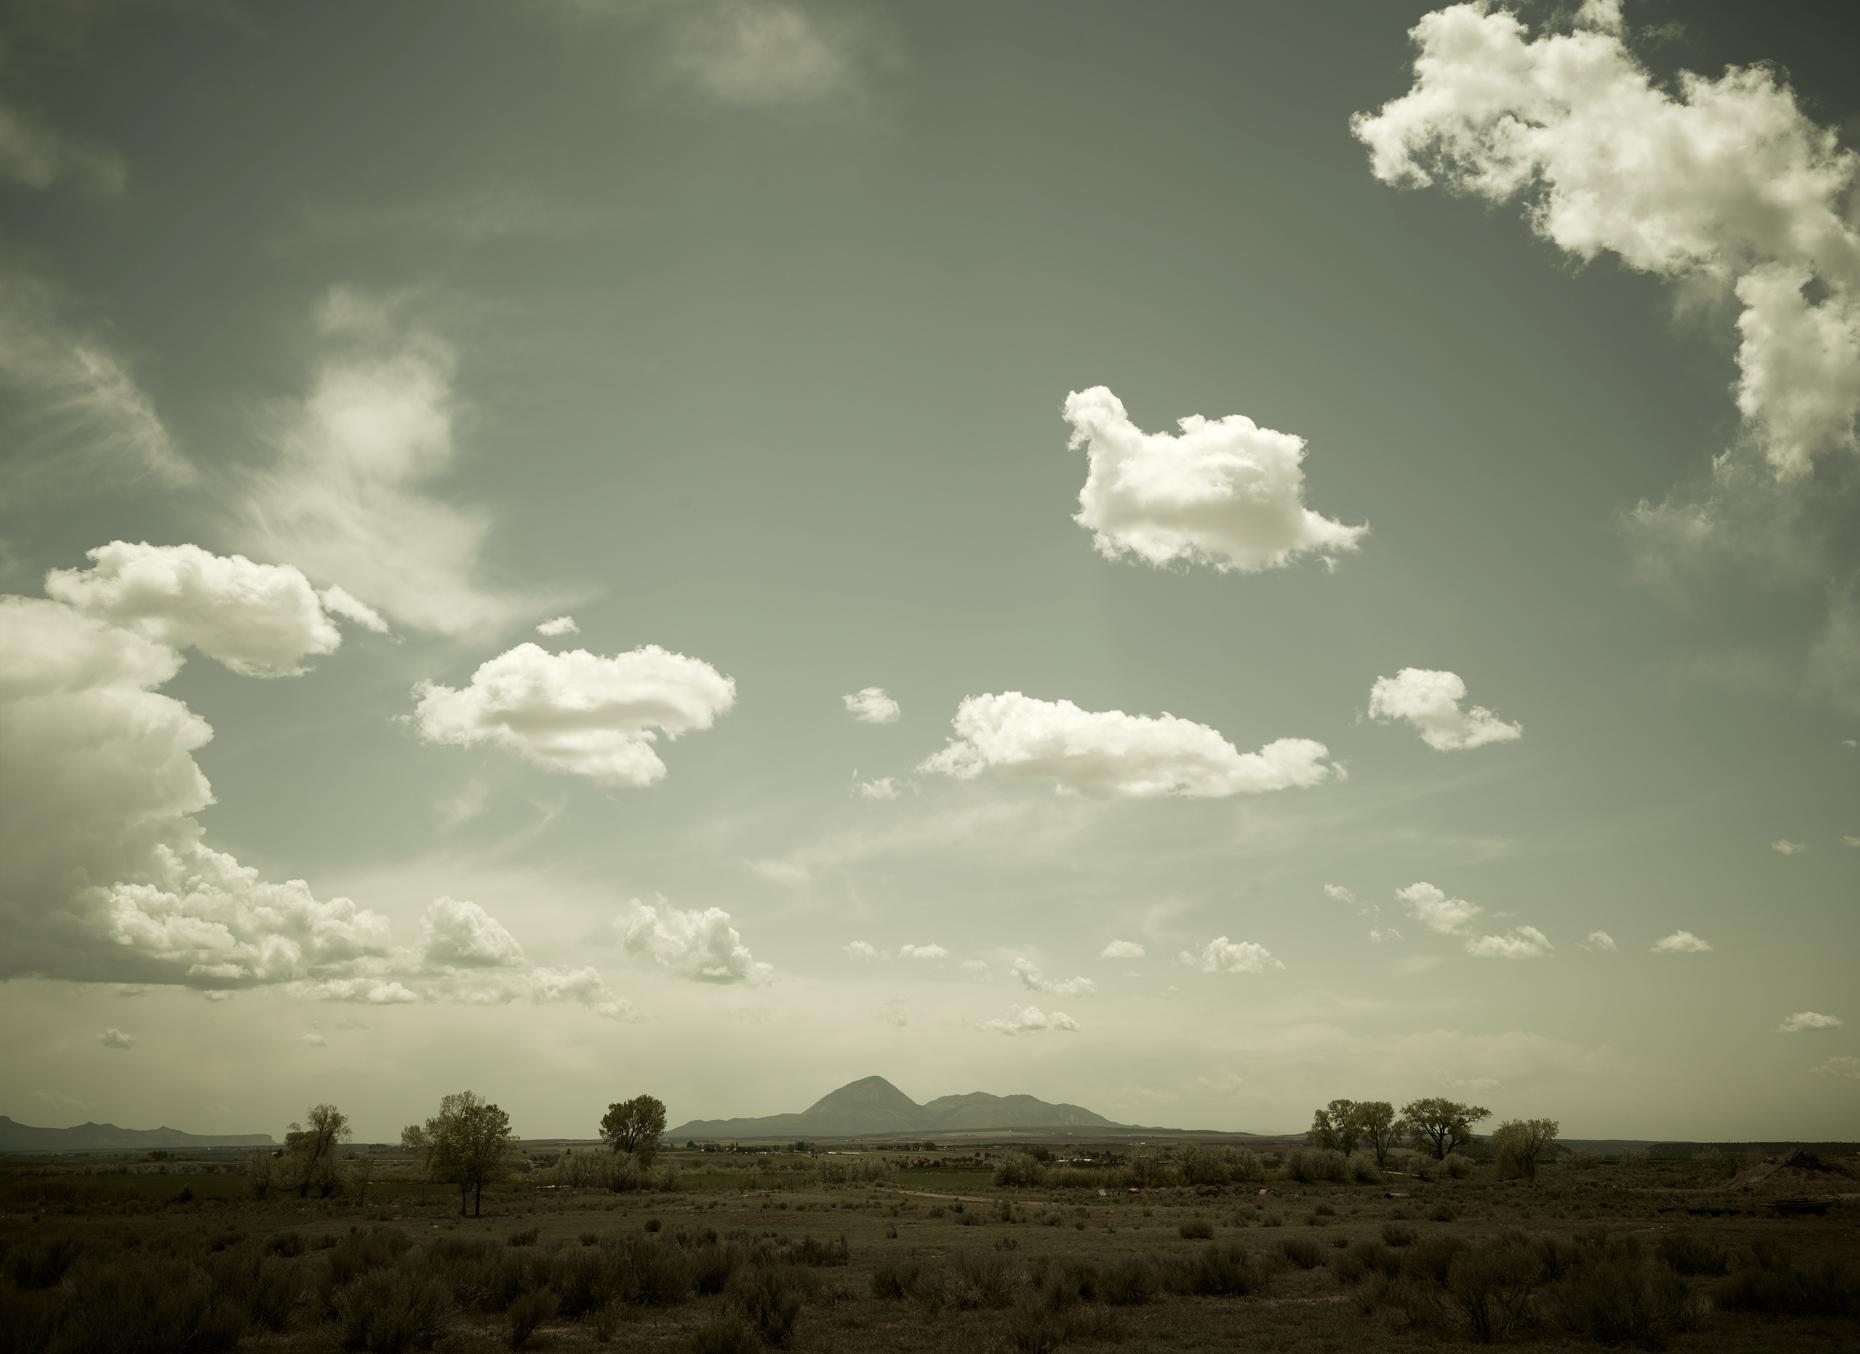 Travel Photography Derek Israelsen 028 Distant Mountain